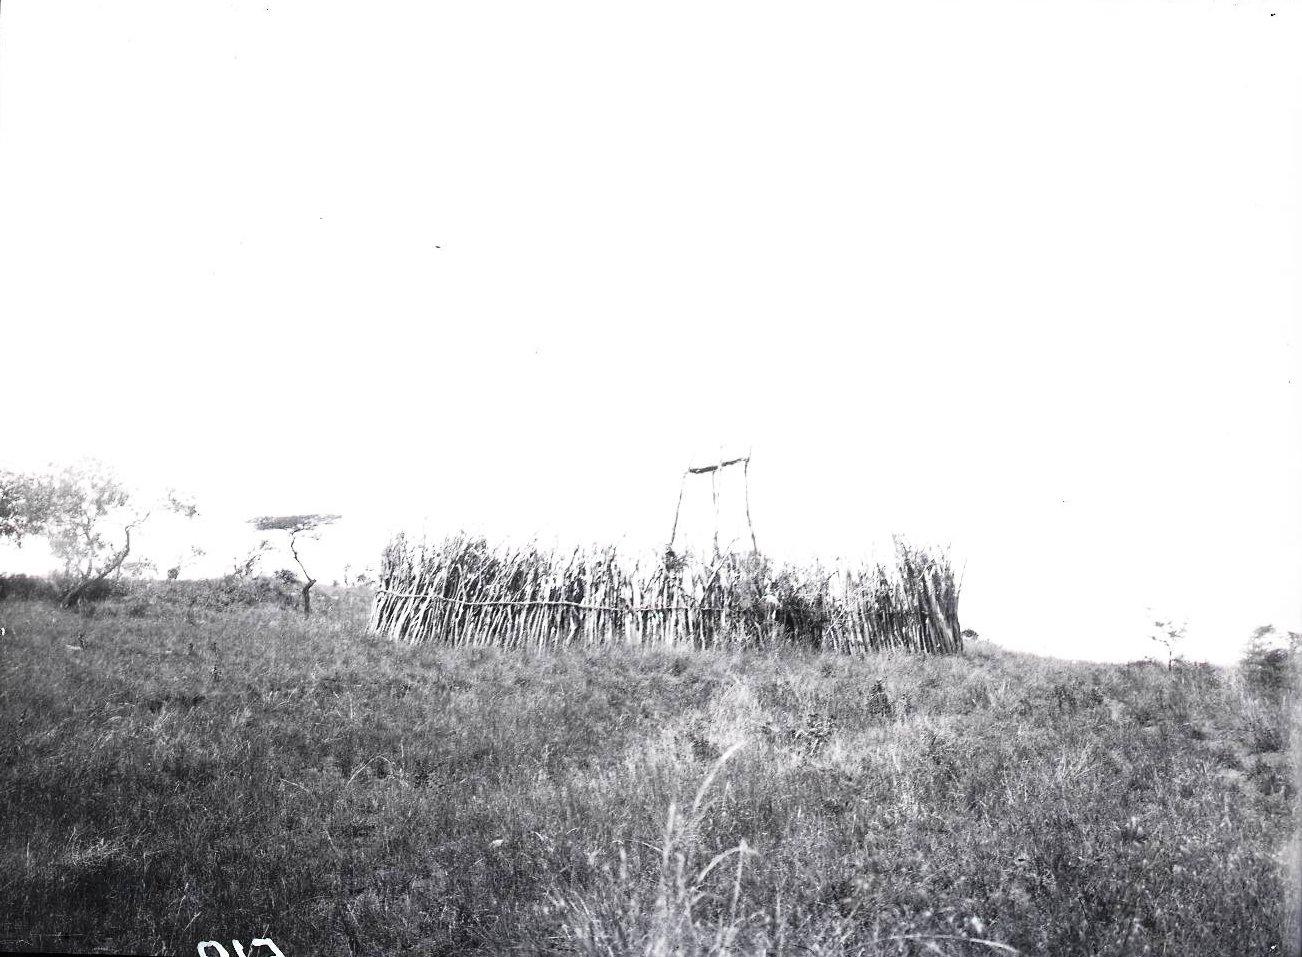 512. Сторожка на границе провинции Уоламо. Омето